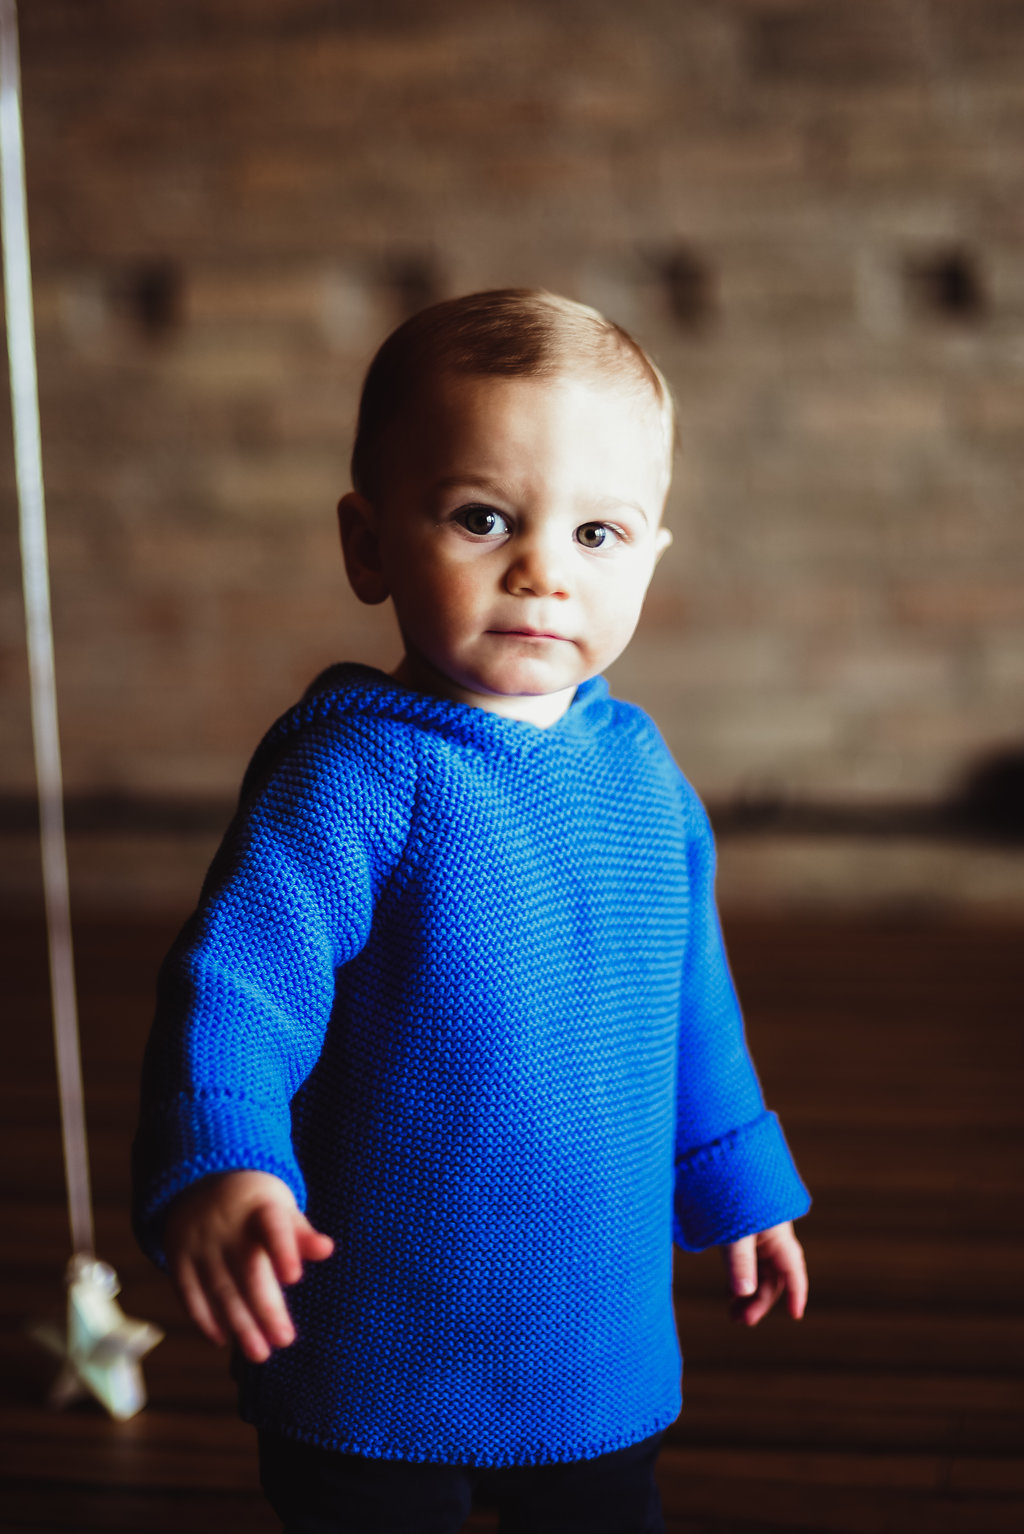 Skaneateles, New York baby boy's first birthday indoor studio portrait photography // Emma Bauso Design, Emma Bauso Photography. Sky Yoga and Wellness, Auburn and Syracuse New York family photography